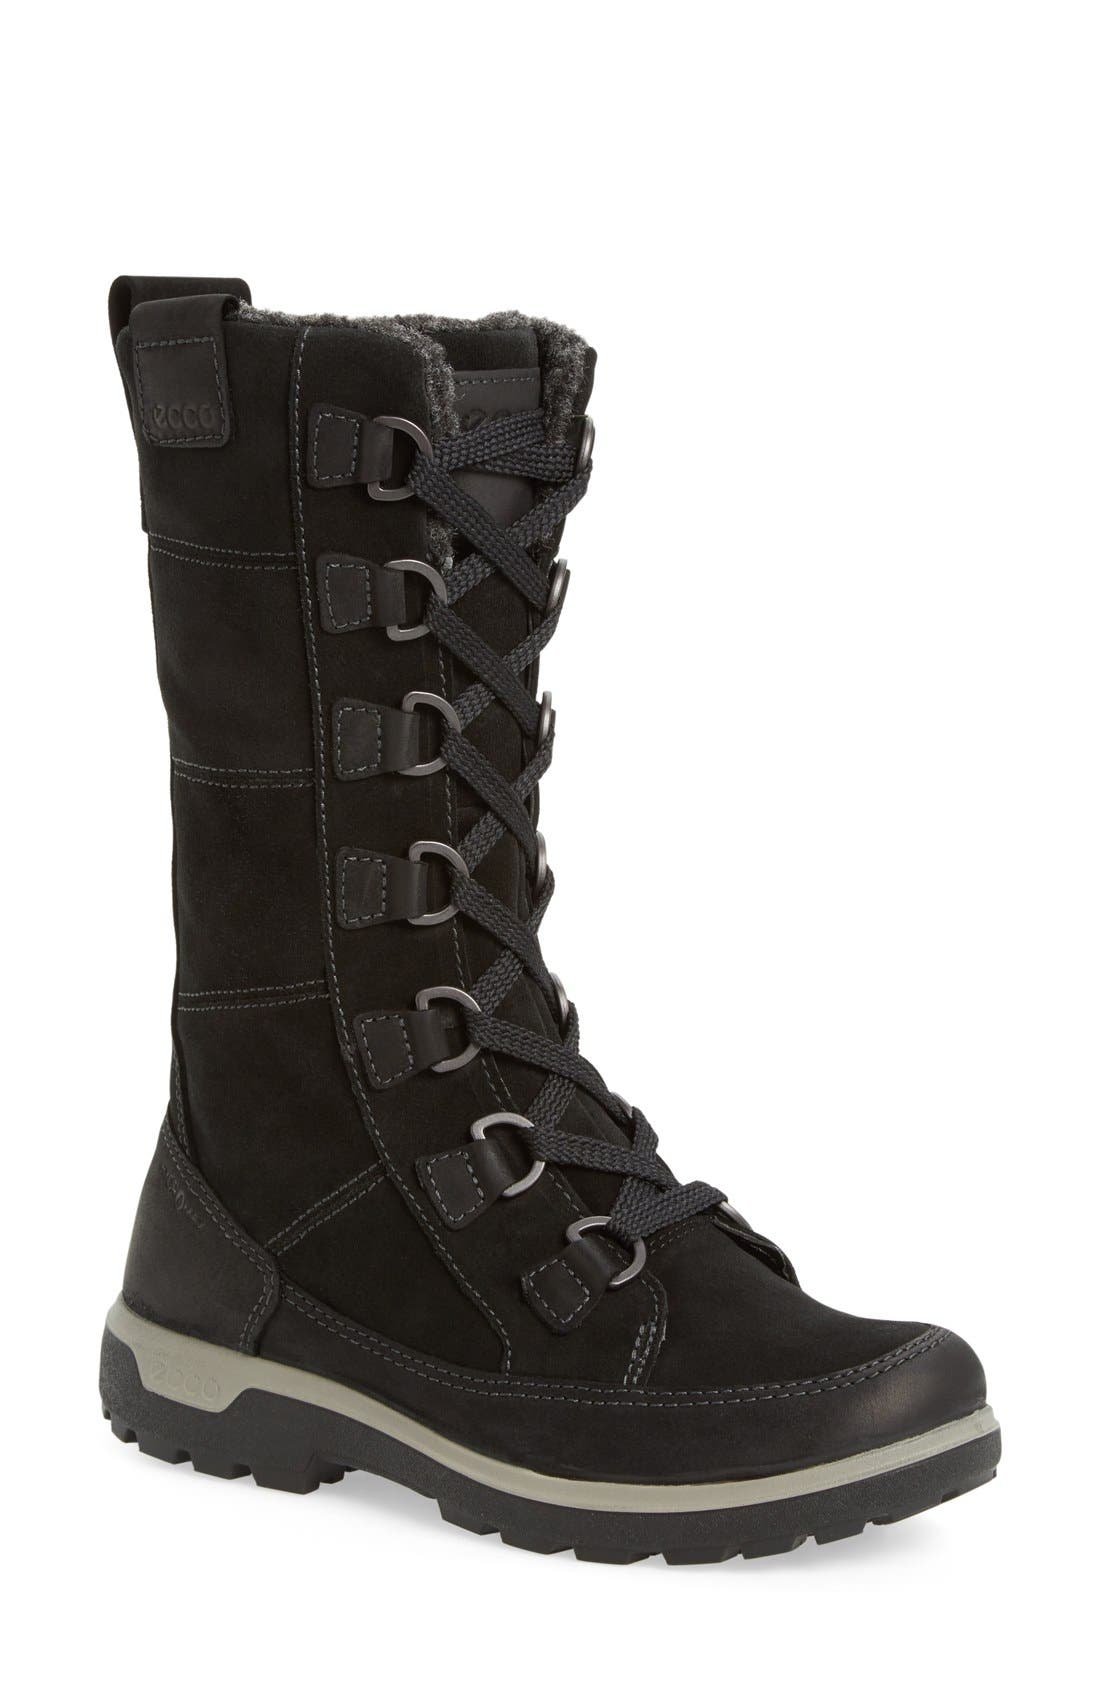 'Gora' Gore-Tex<sup>®</sup> Waterproof Lace-Up Boot,                             Main thumbnail 1, color,                             019